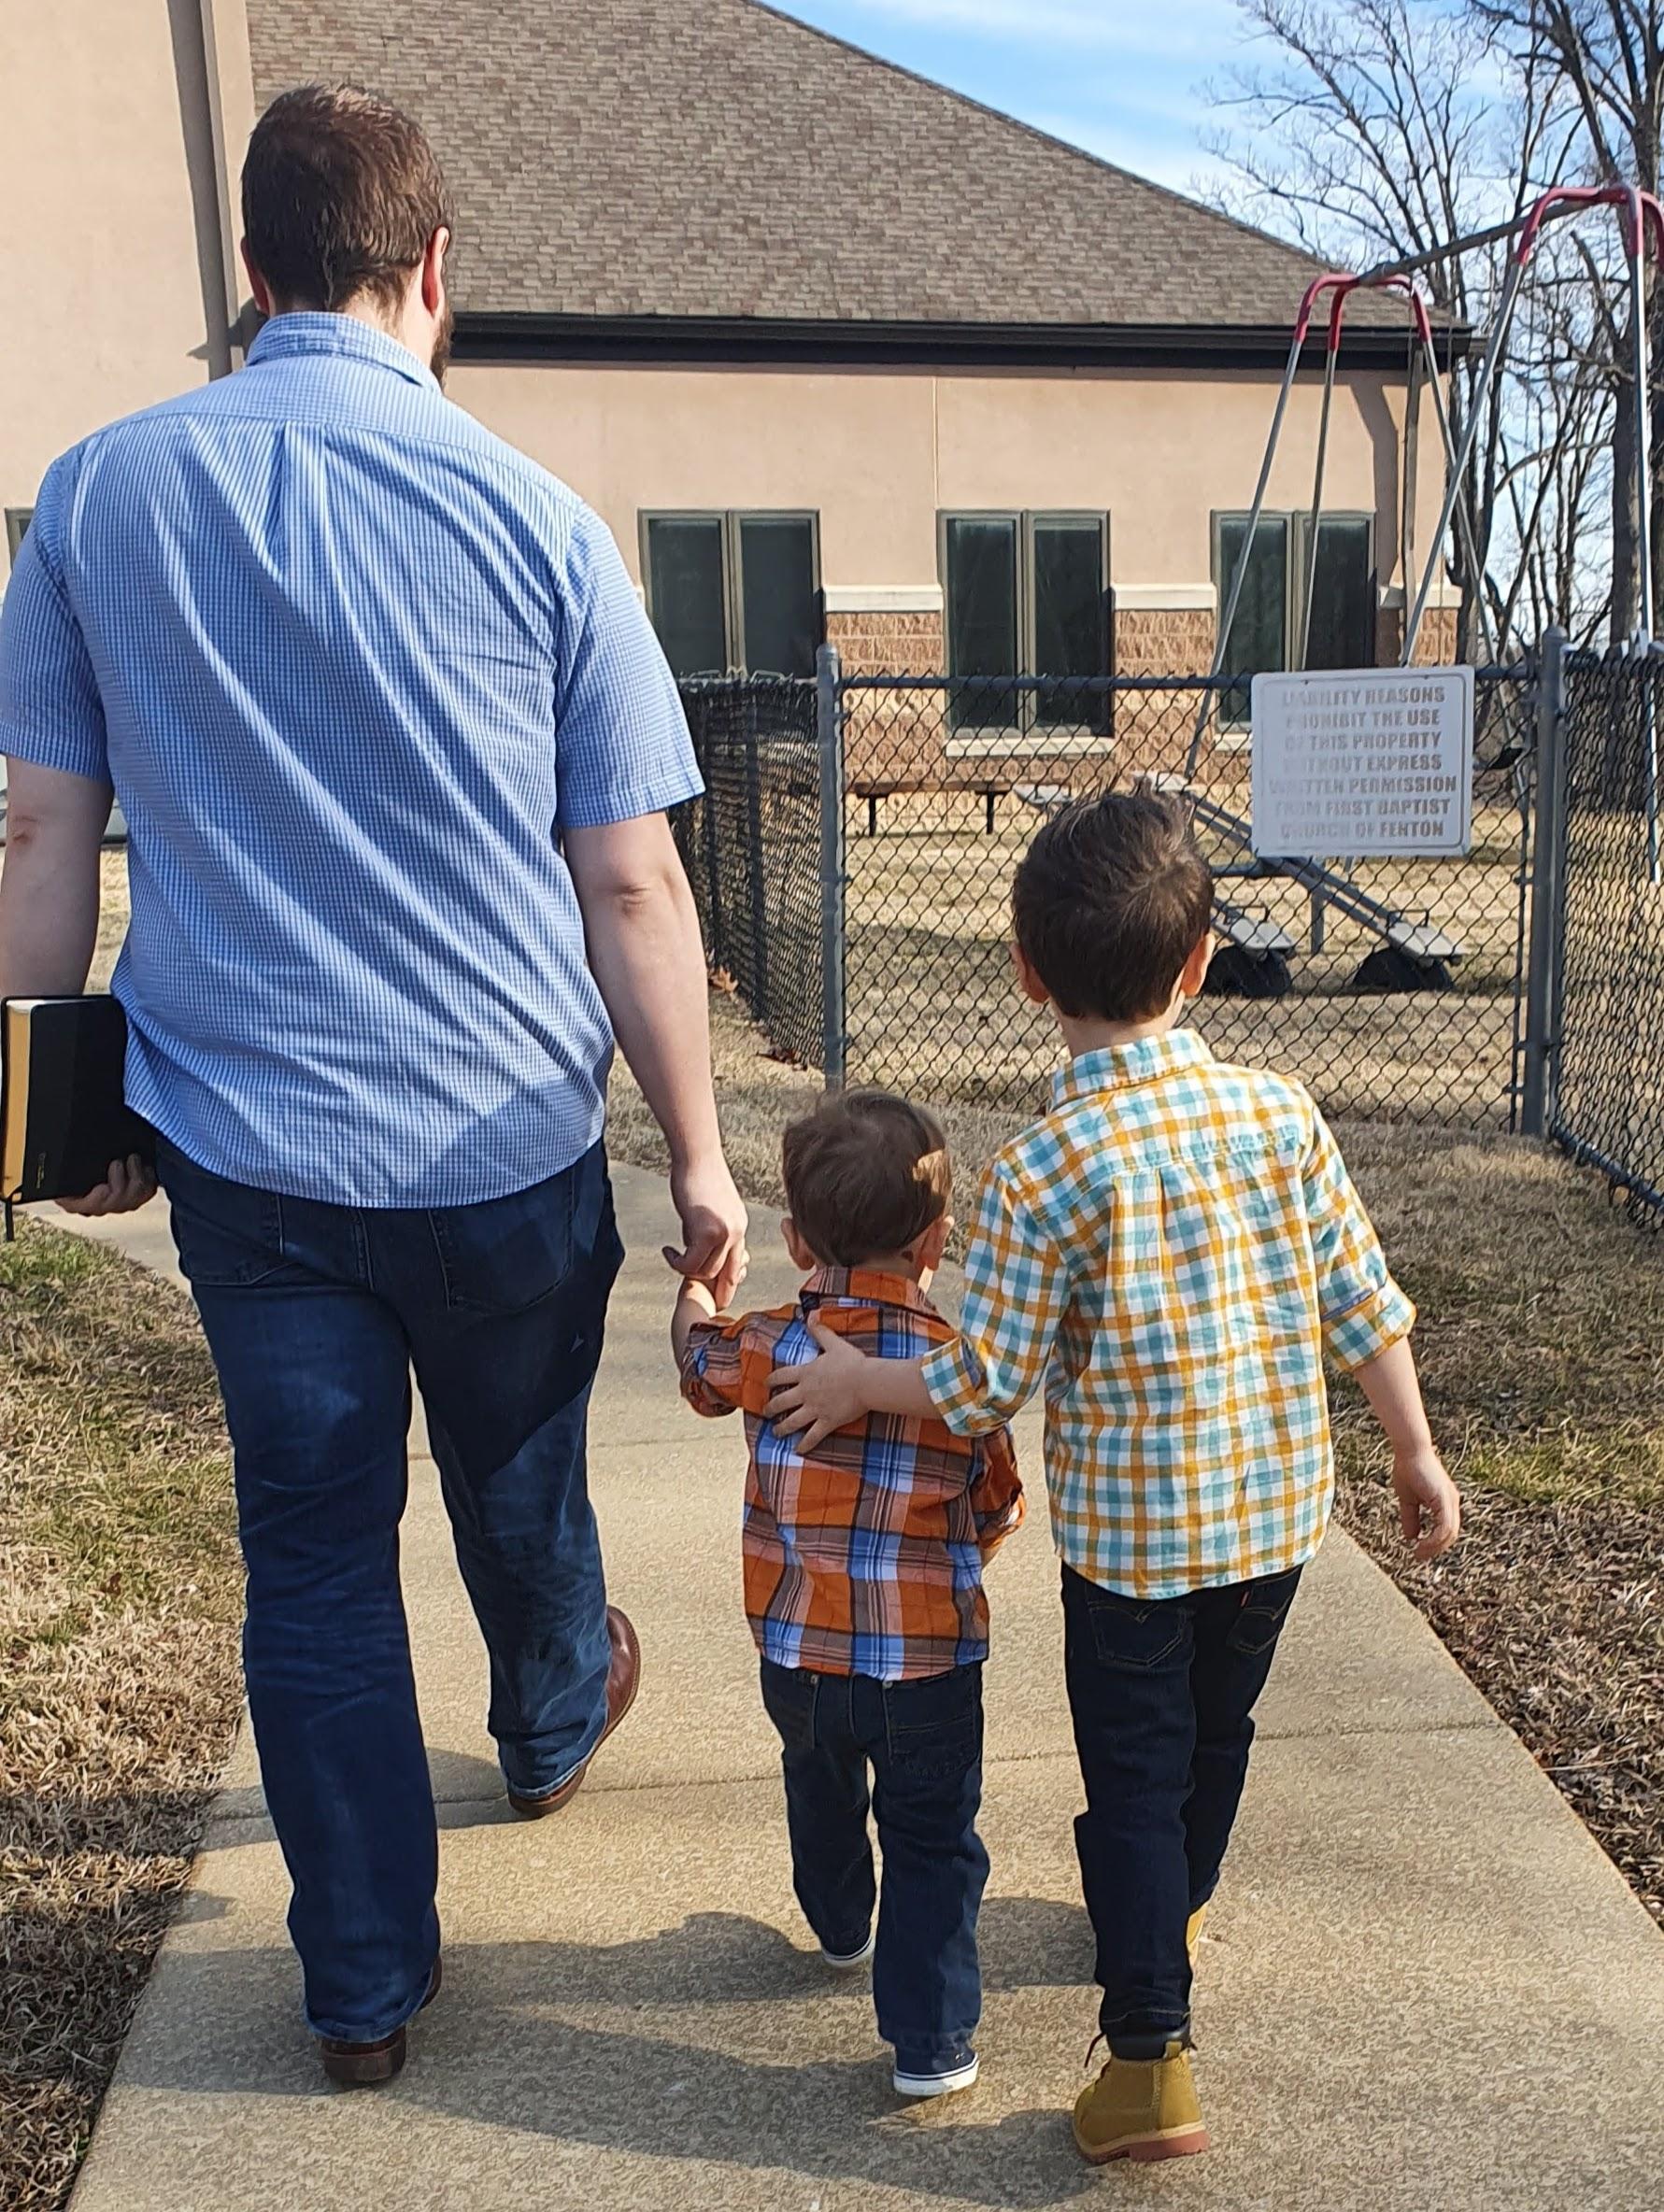 Father's Day,prayer,husband,father,children,raising men,devotionals